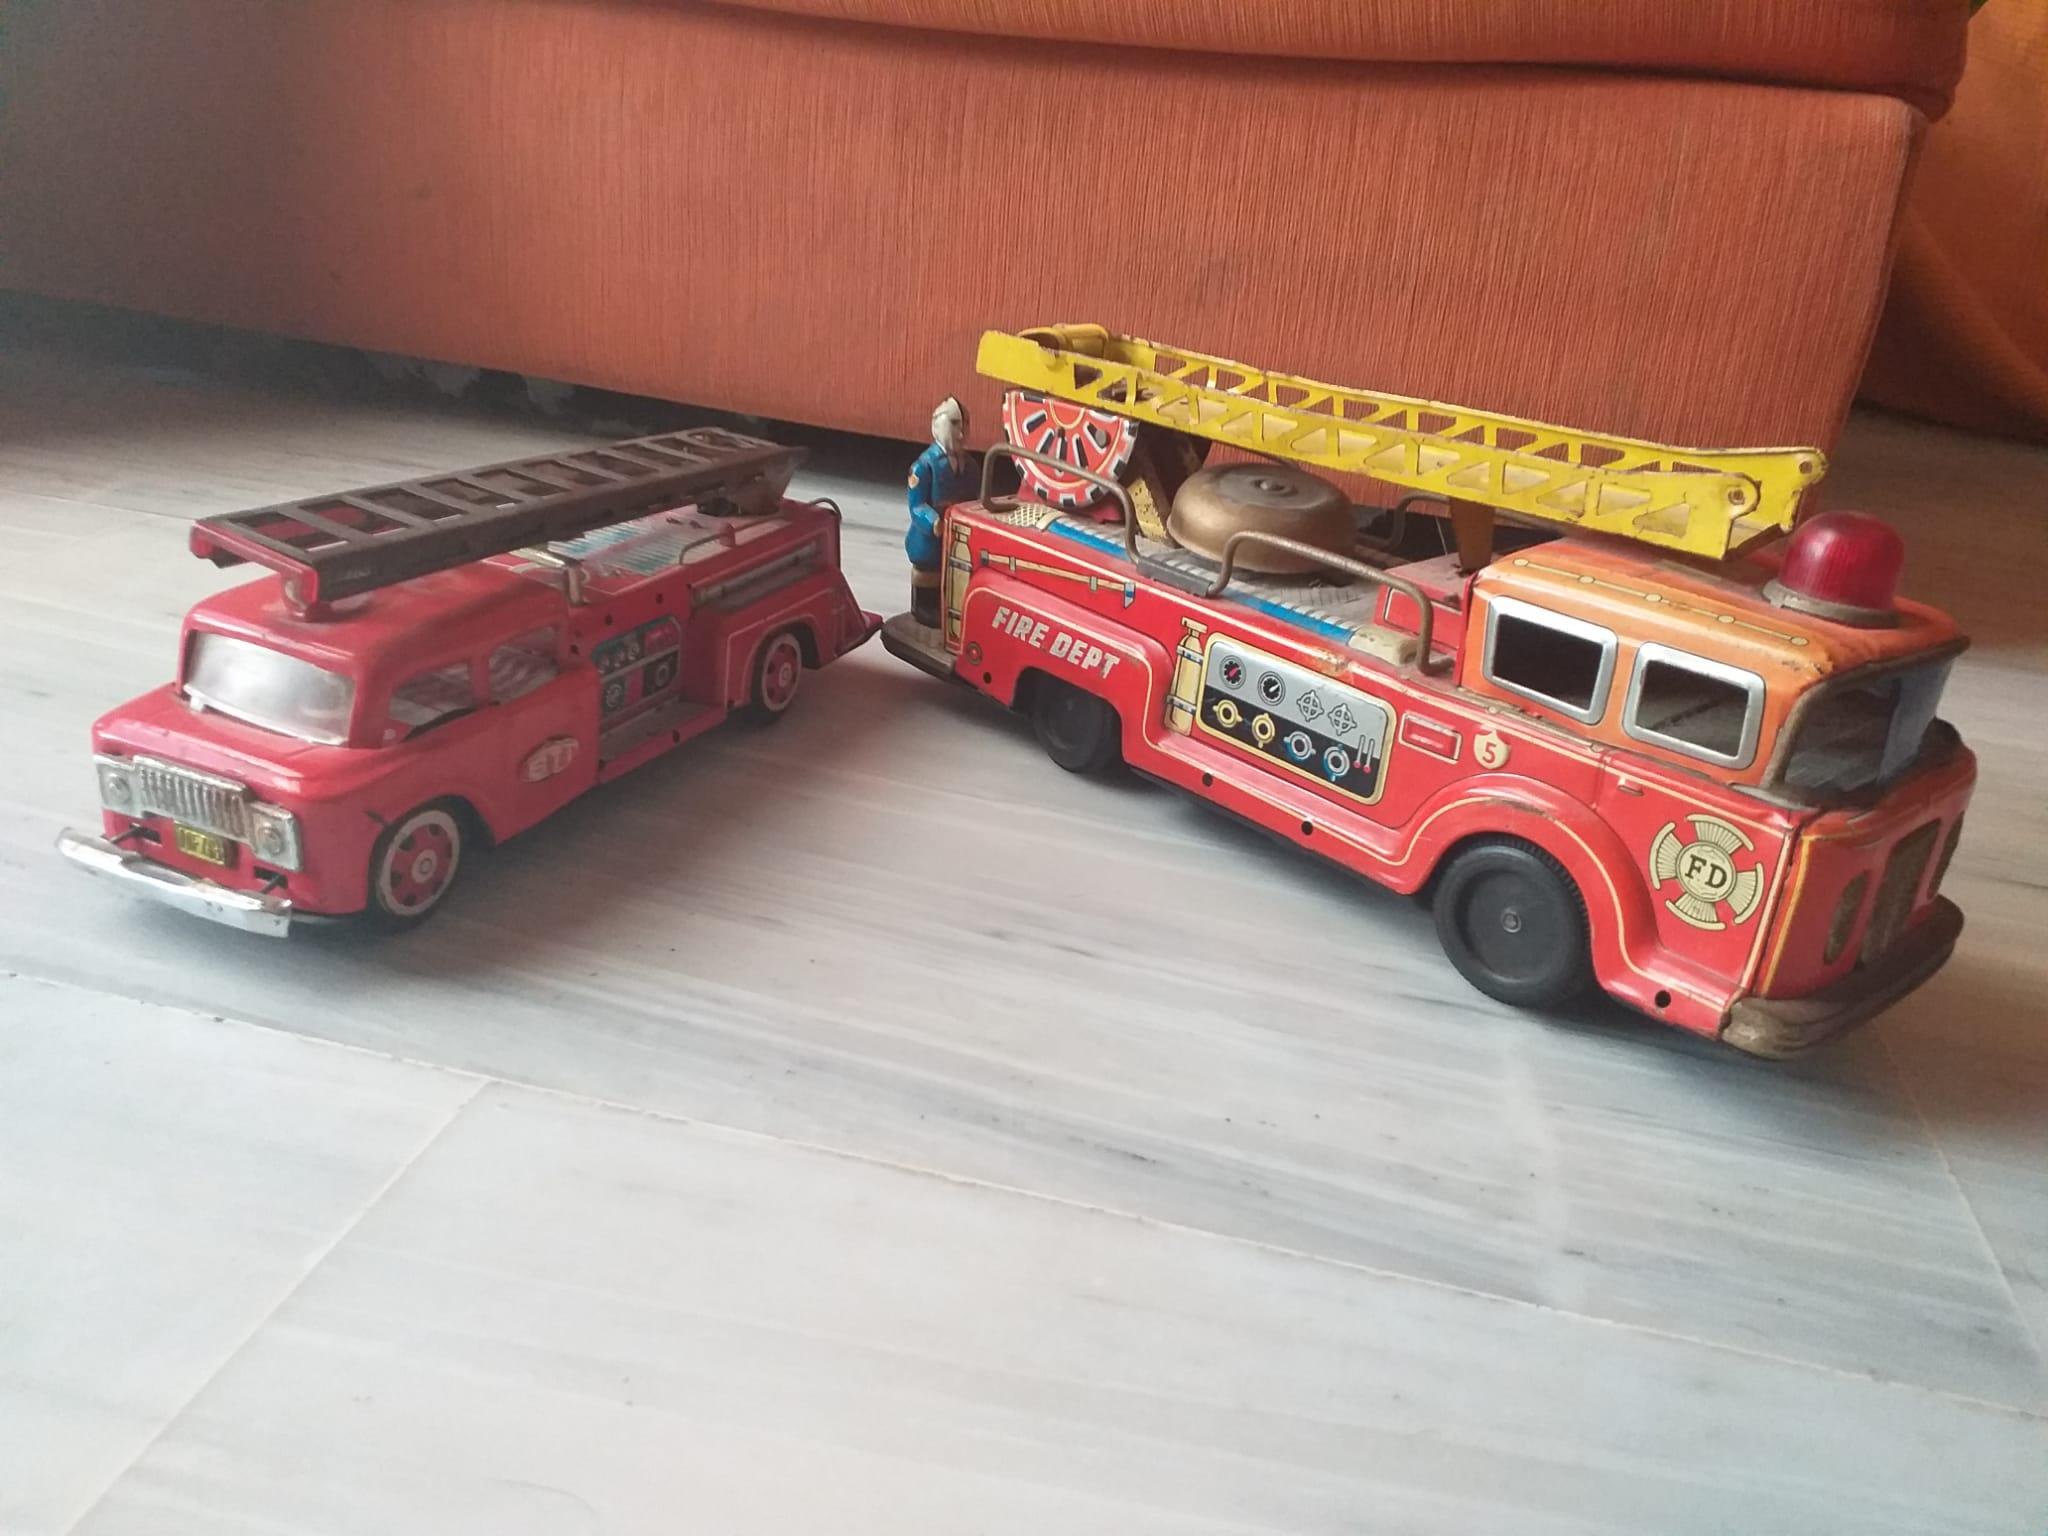 Juguetes de lata camiones bomberos, hojalata, juguetes antiguos, colección